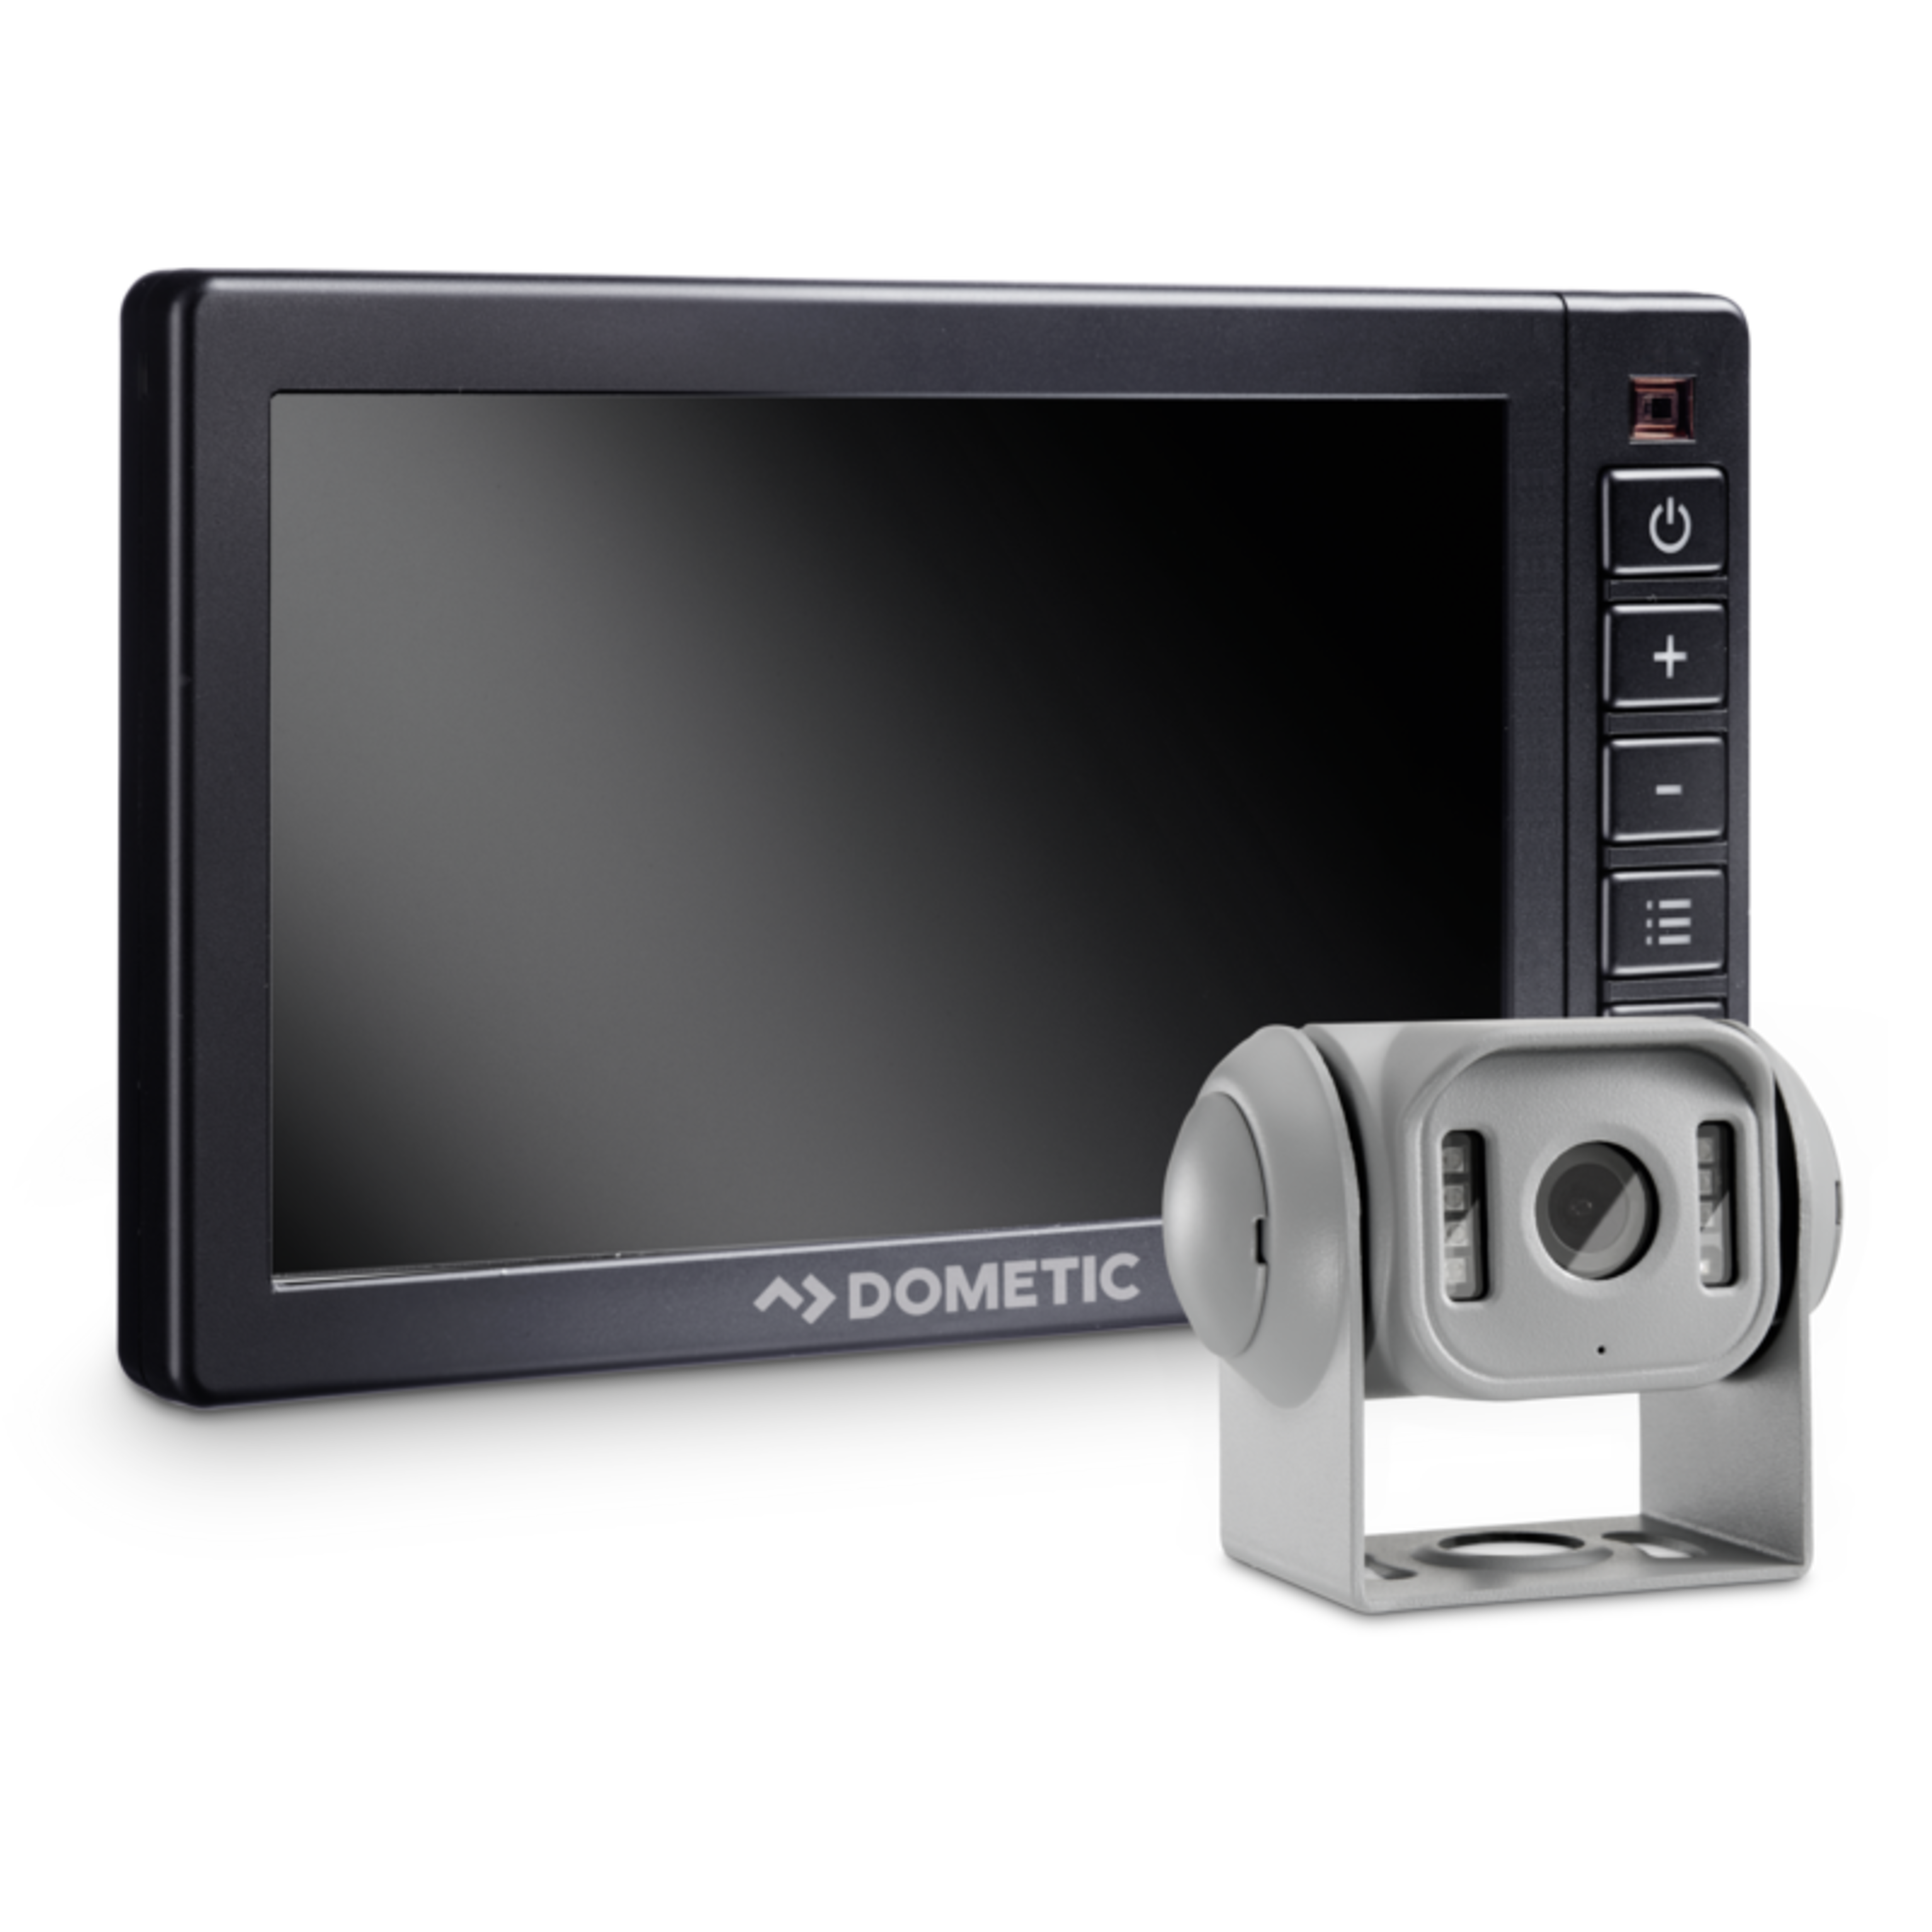 Dometic PerfectView RVS 555X